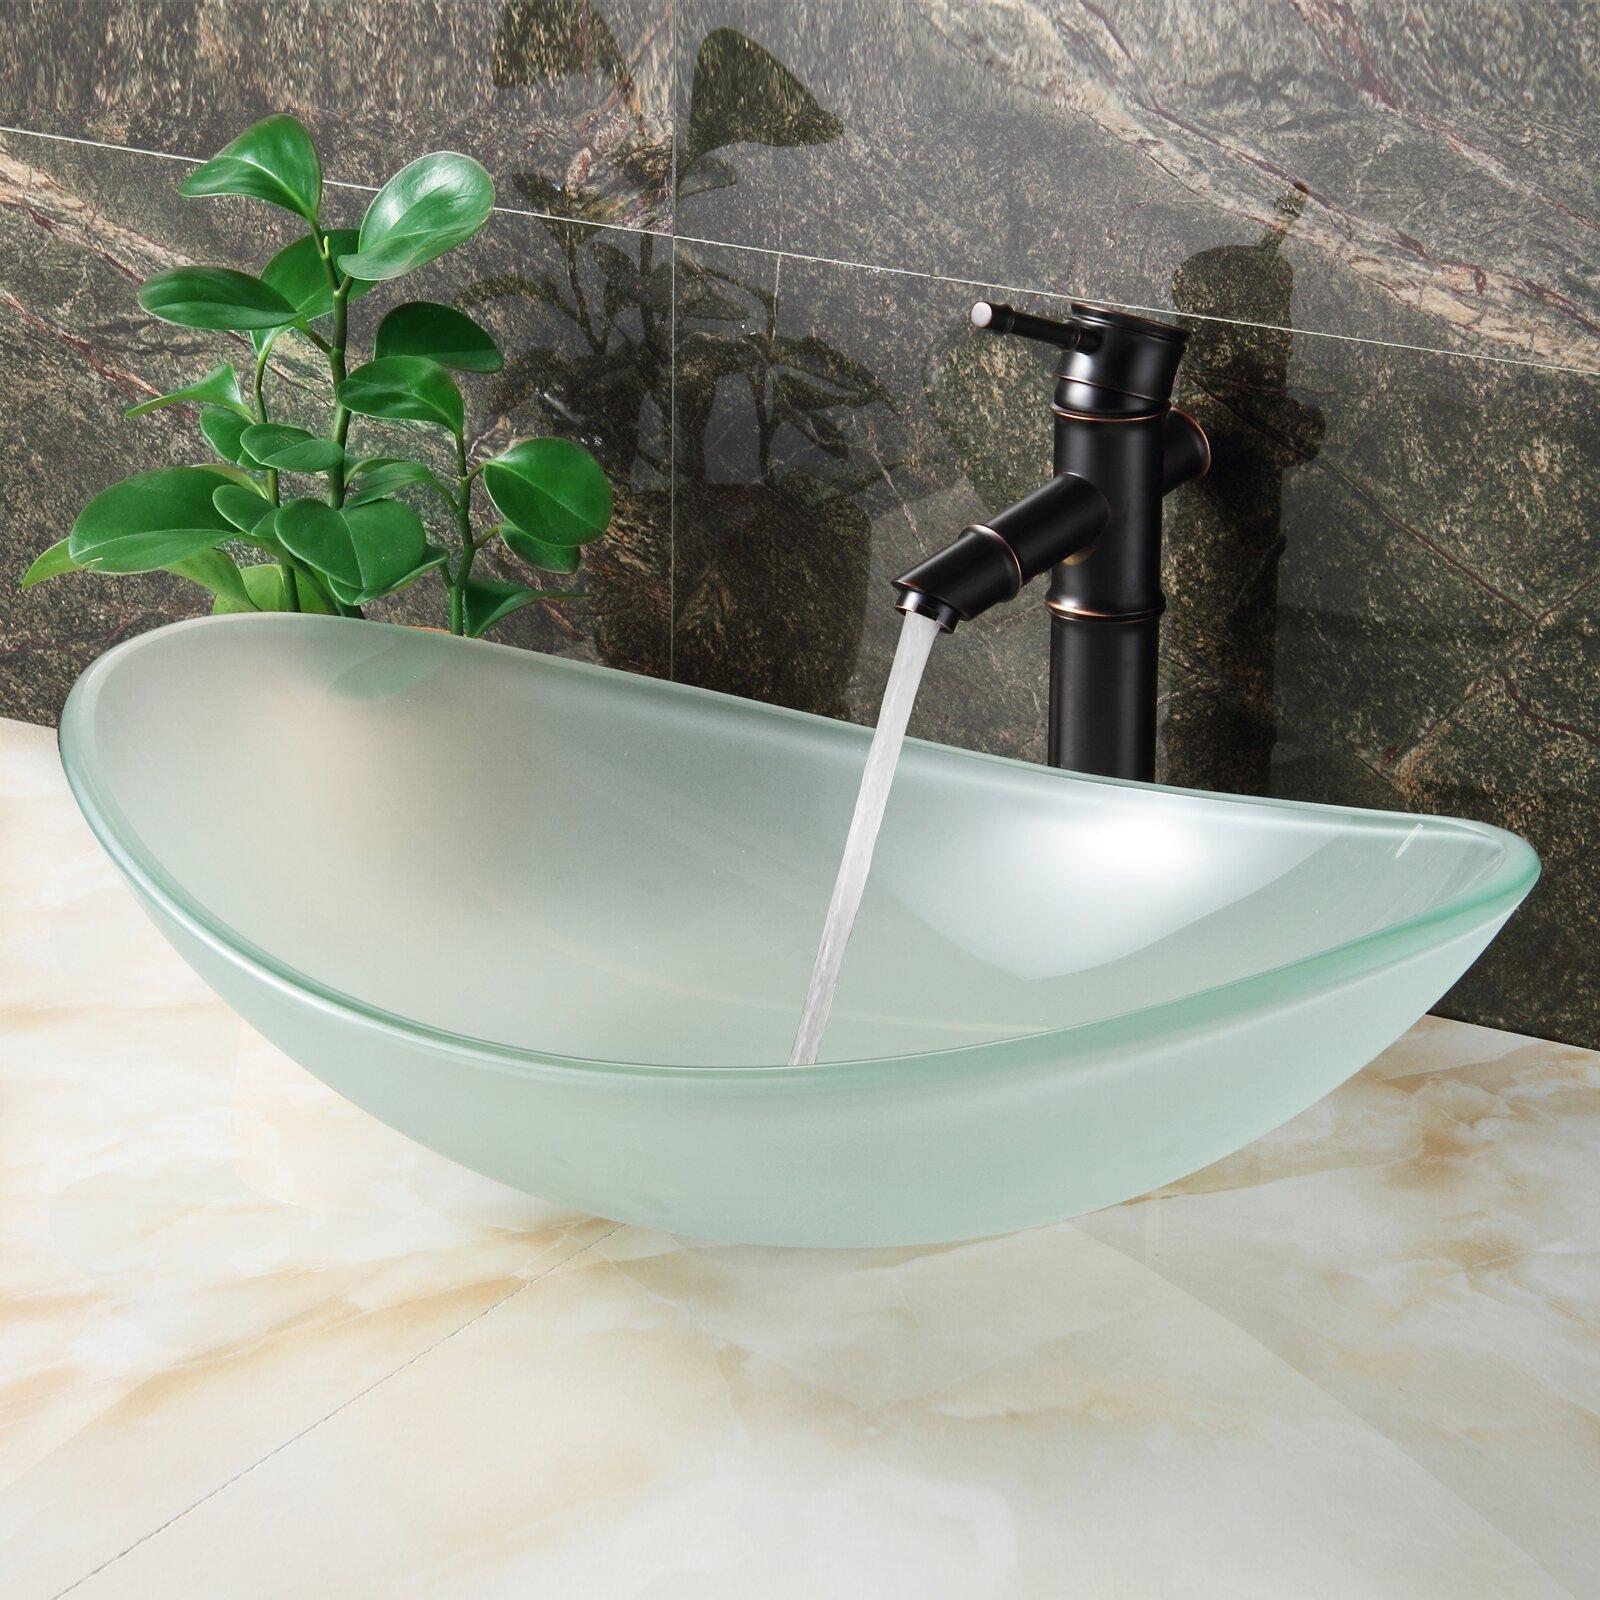 Glass Bathroom Sink Bowls : ... Layered Tempered Glass Boat Shaped Bowl Vessel Bathroom Sink by Elite